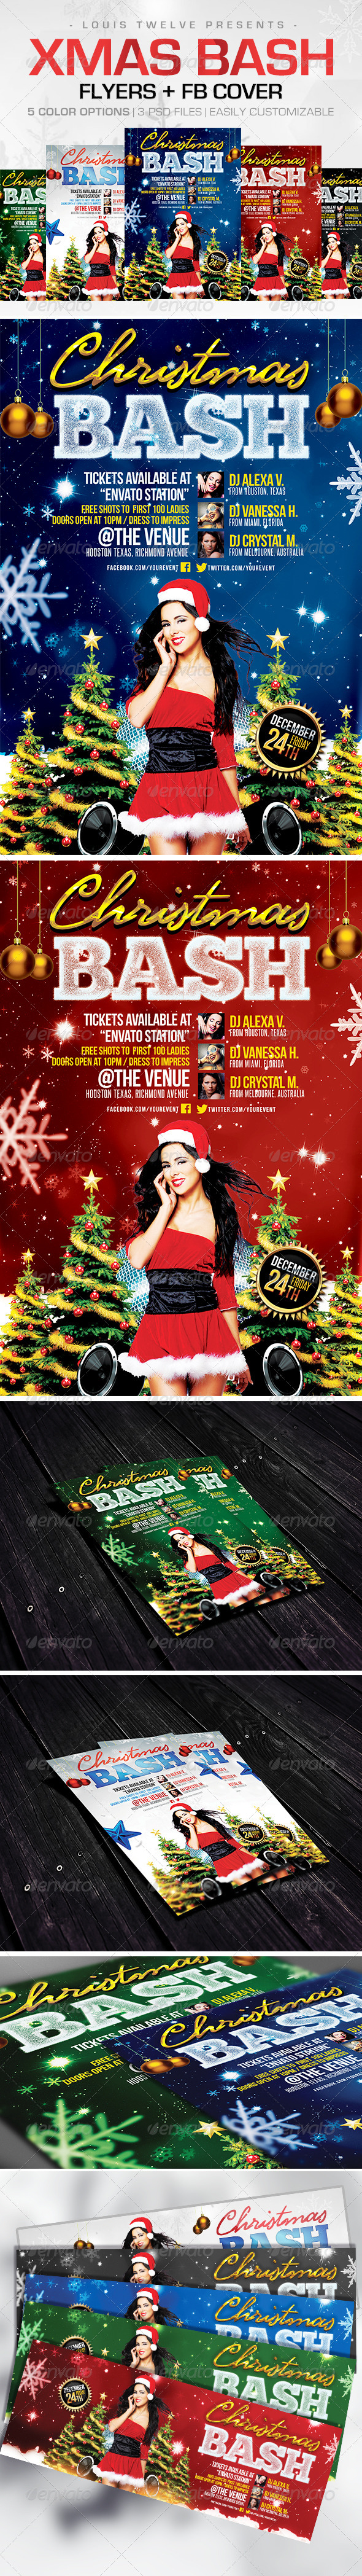 GraphicRiver Christmas Bash Flyers & FB Cover 6076635